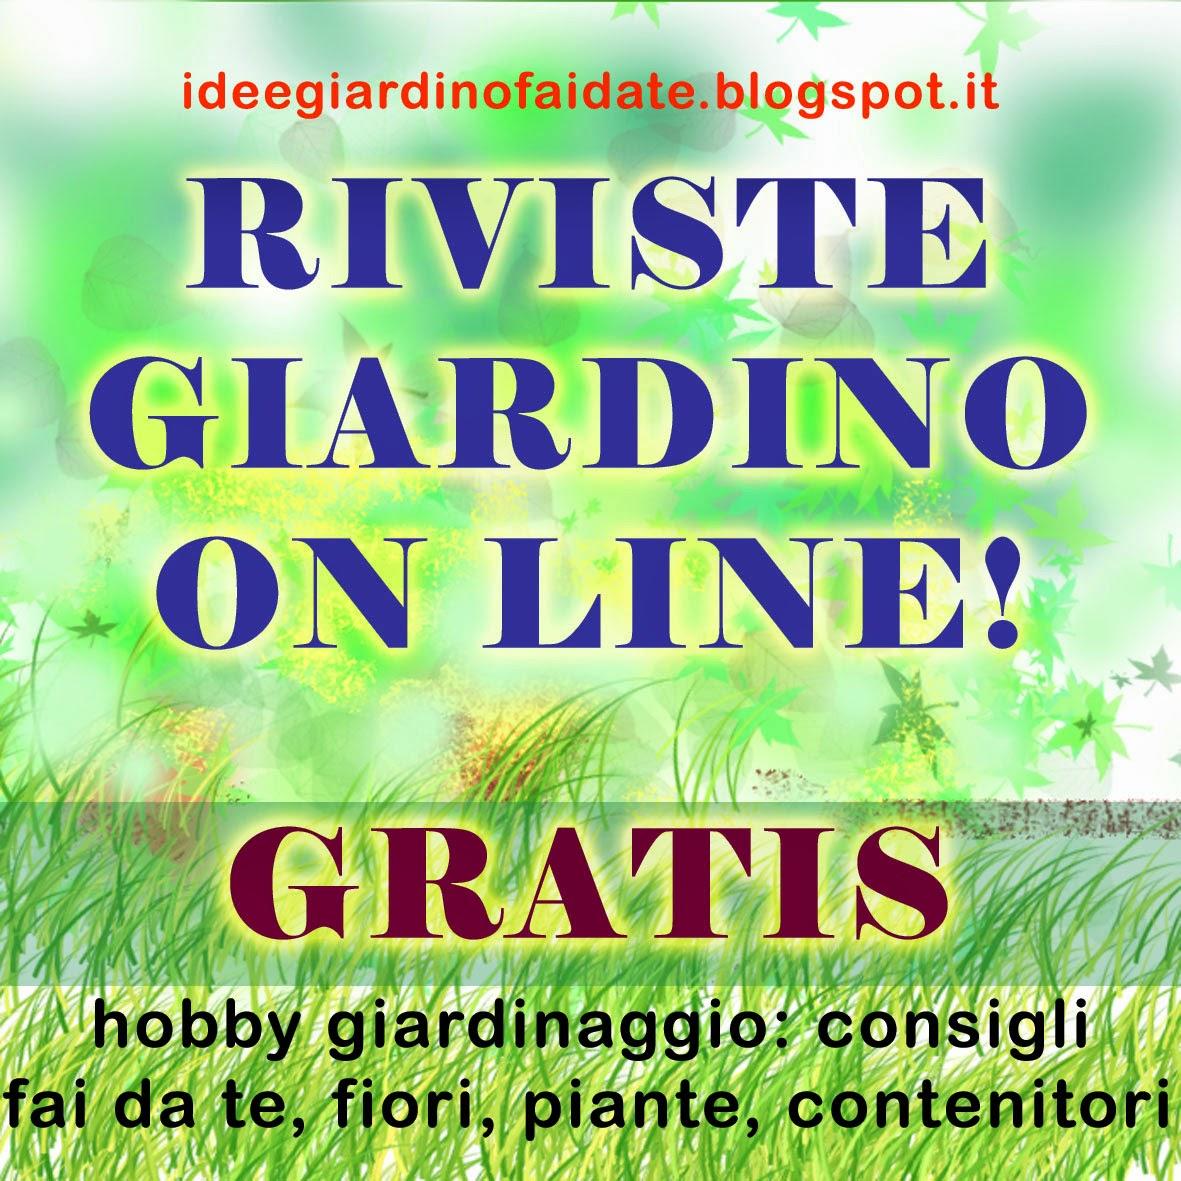 RIVISTE GRATIS GIARDINO ON LINE! tutti i siti giornali ...